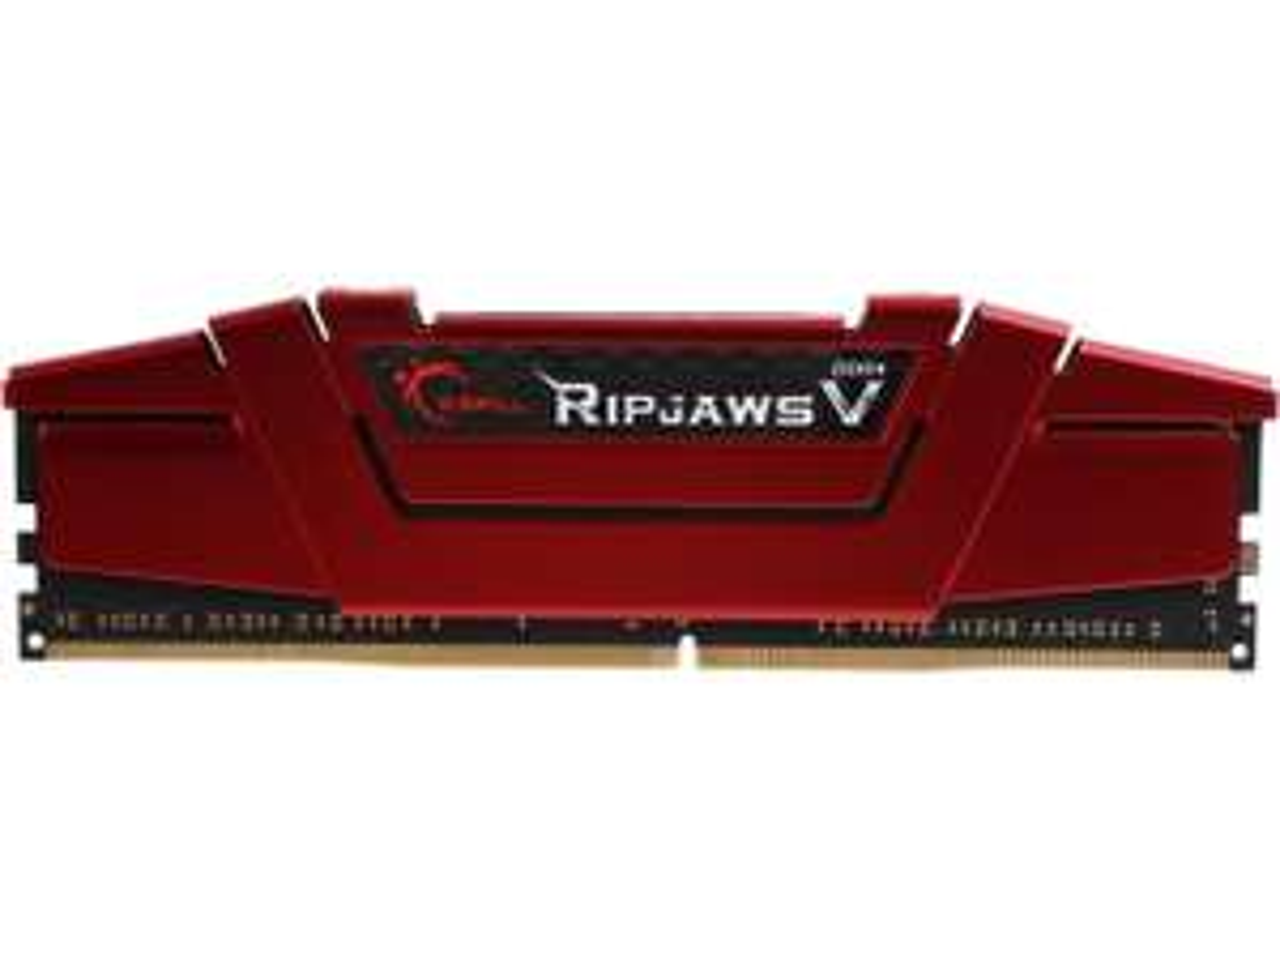 Gskill Ripjaws DDR4-3000MHz CL15 16GB (1x16GB) Memory Module - £47.59 at Amazon